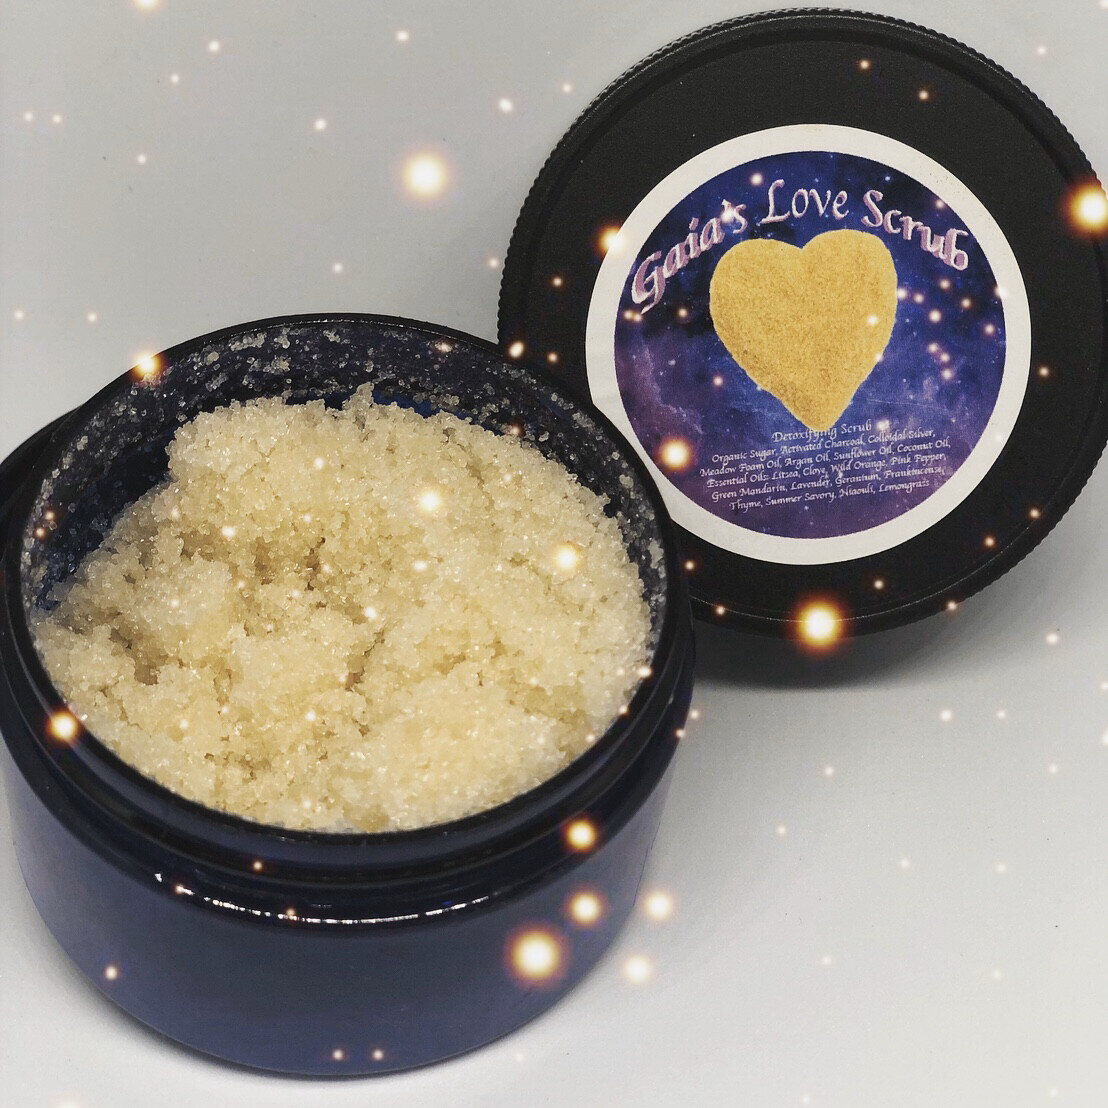 Gaia's Sugar Scrub 4oz